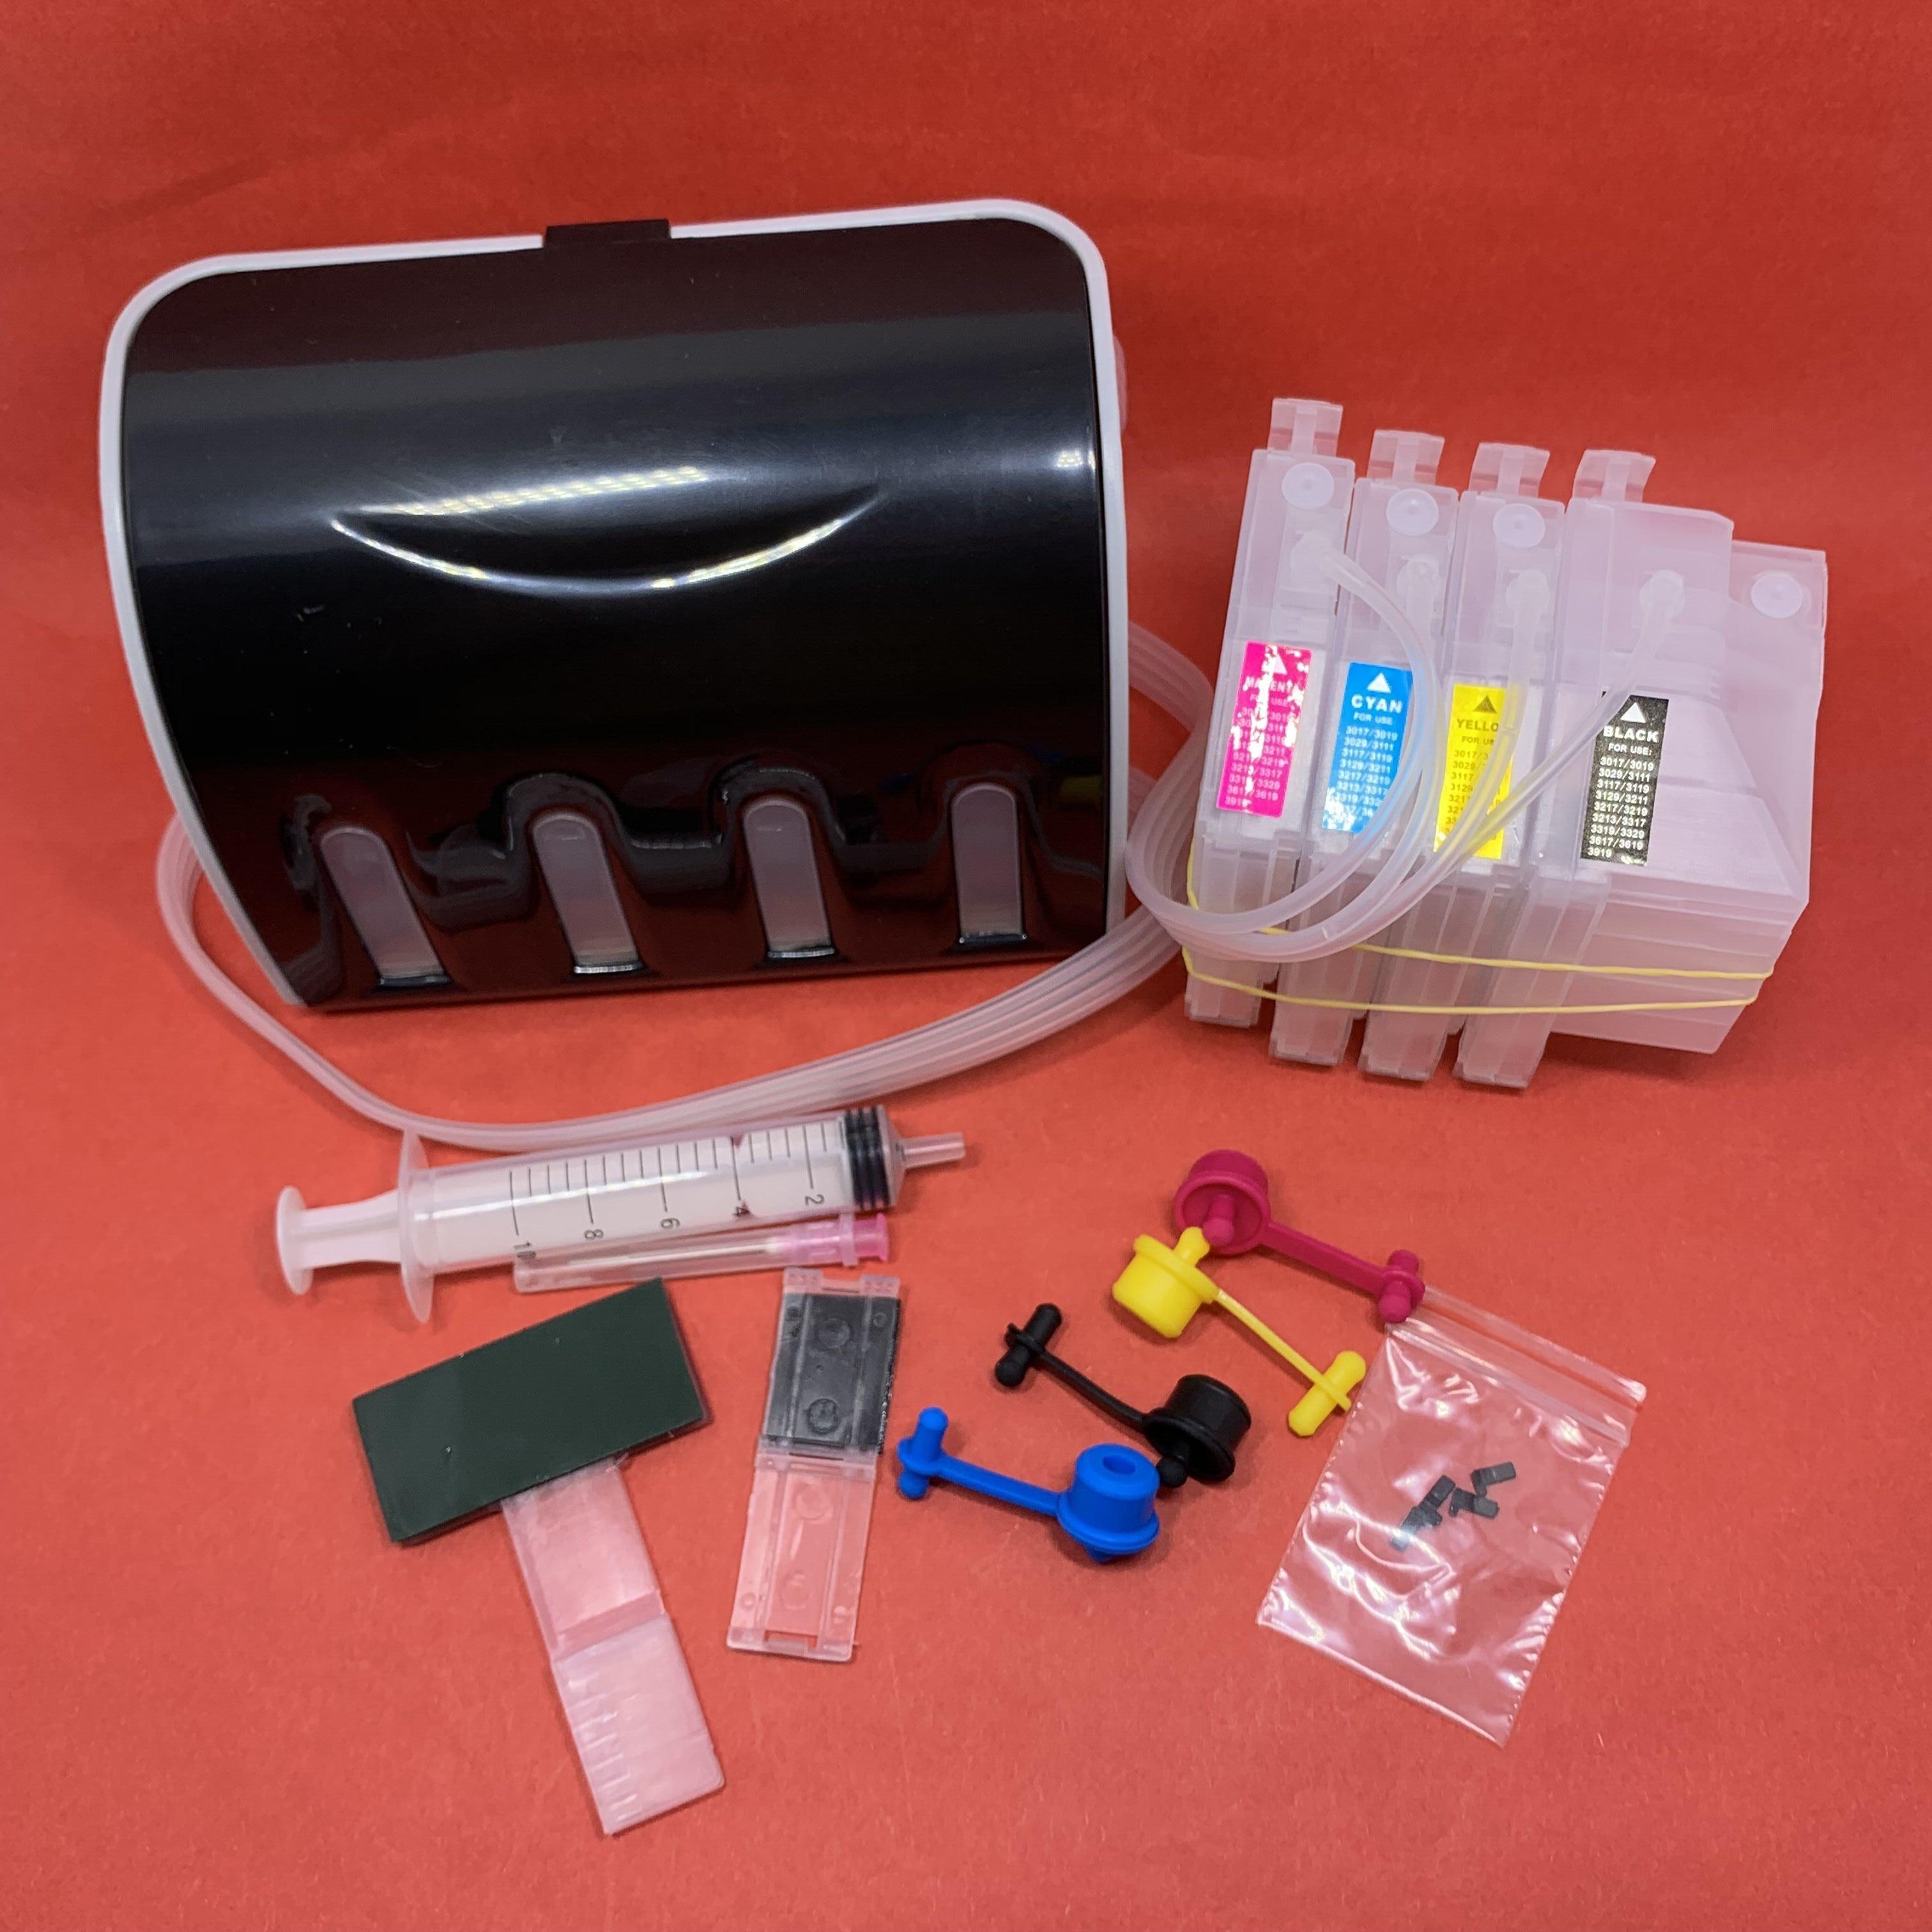 YOTAT CISS tinta cartucho LC3329 LC3329XL hermano MFC-J5930DW MFC-J6935DW impresora